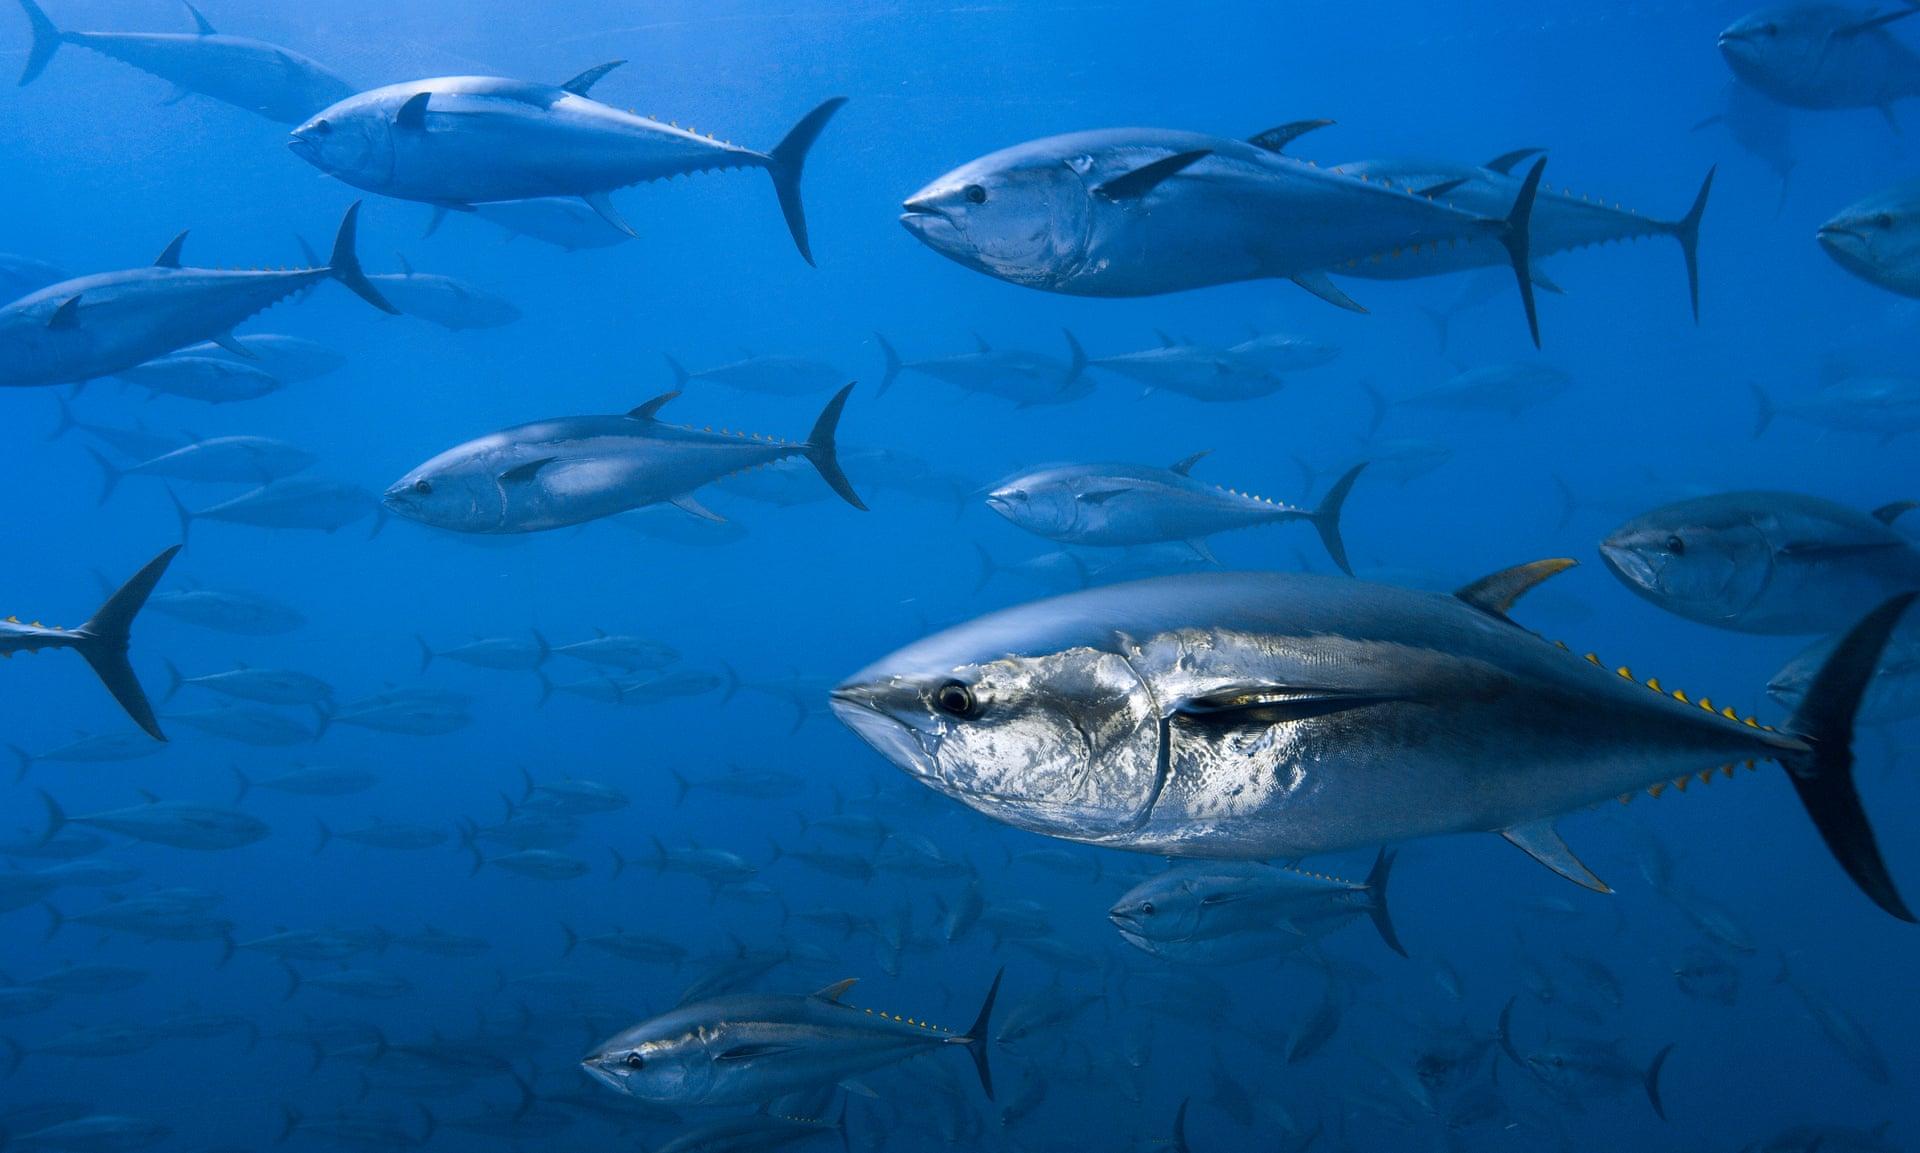 tuna and bluefin